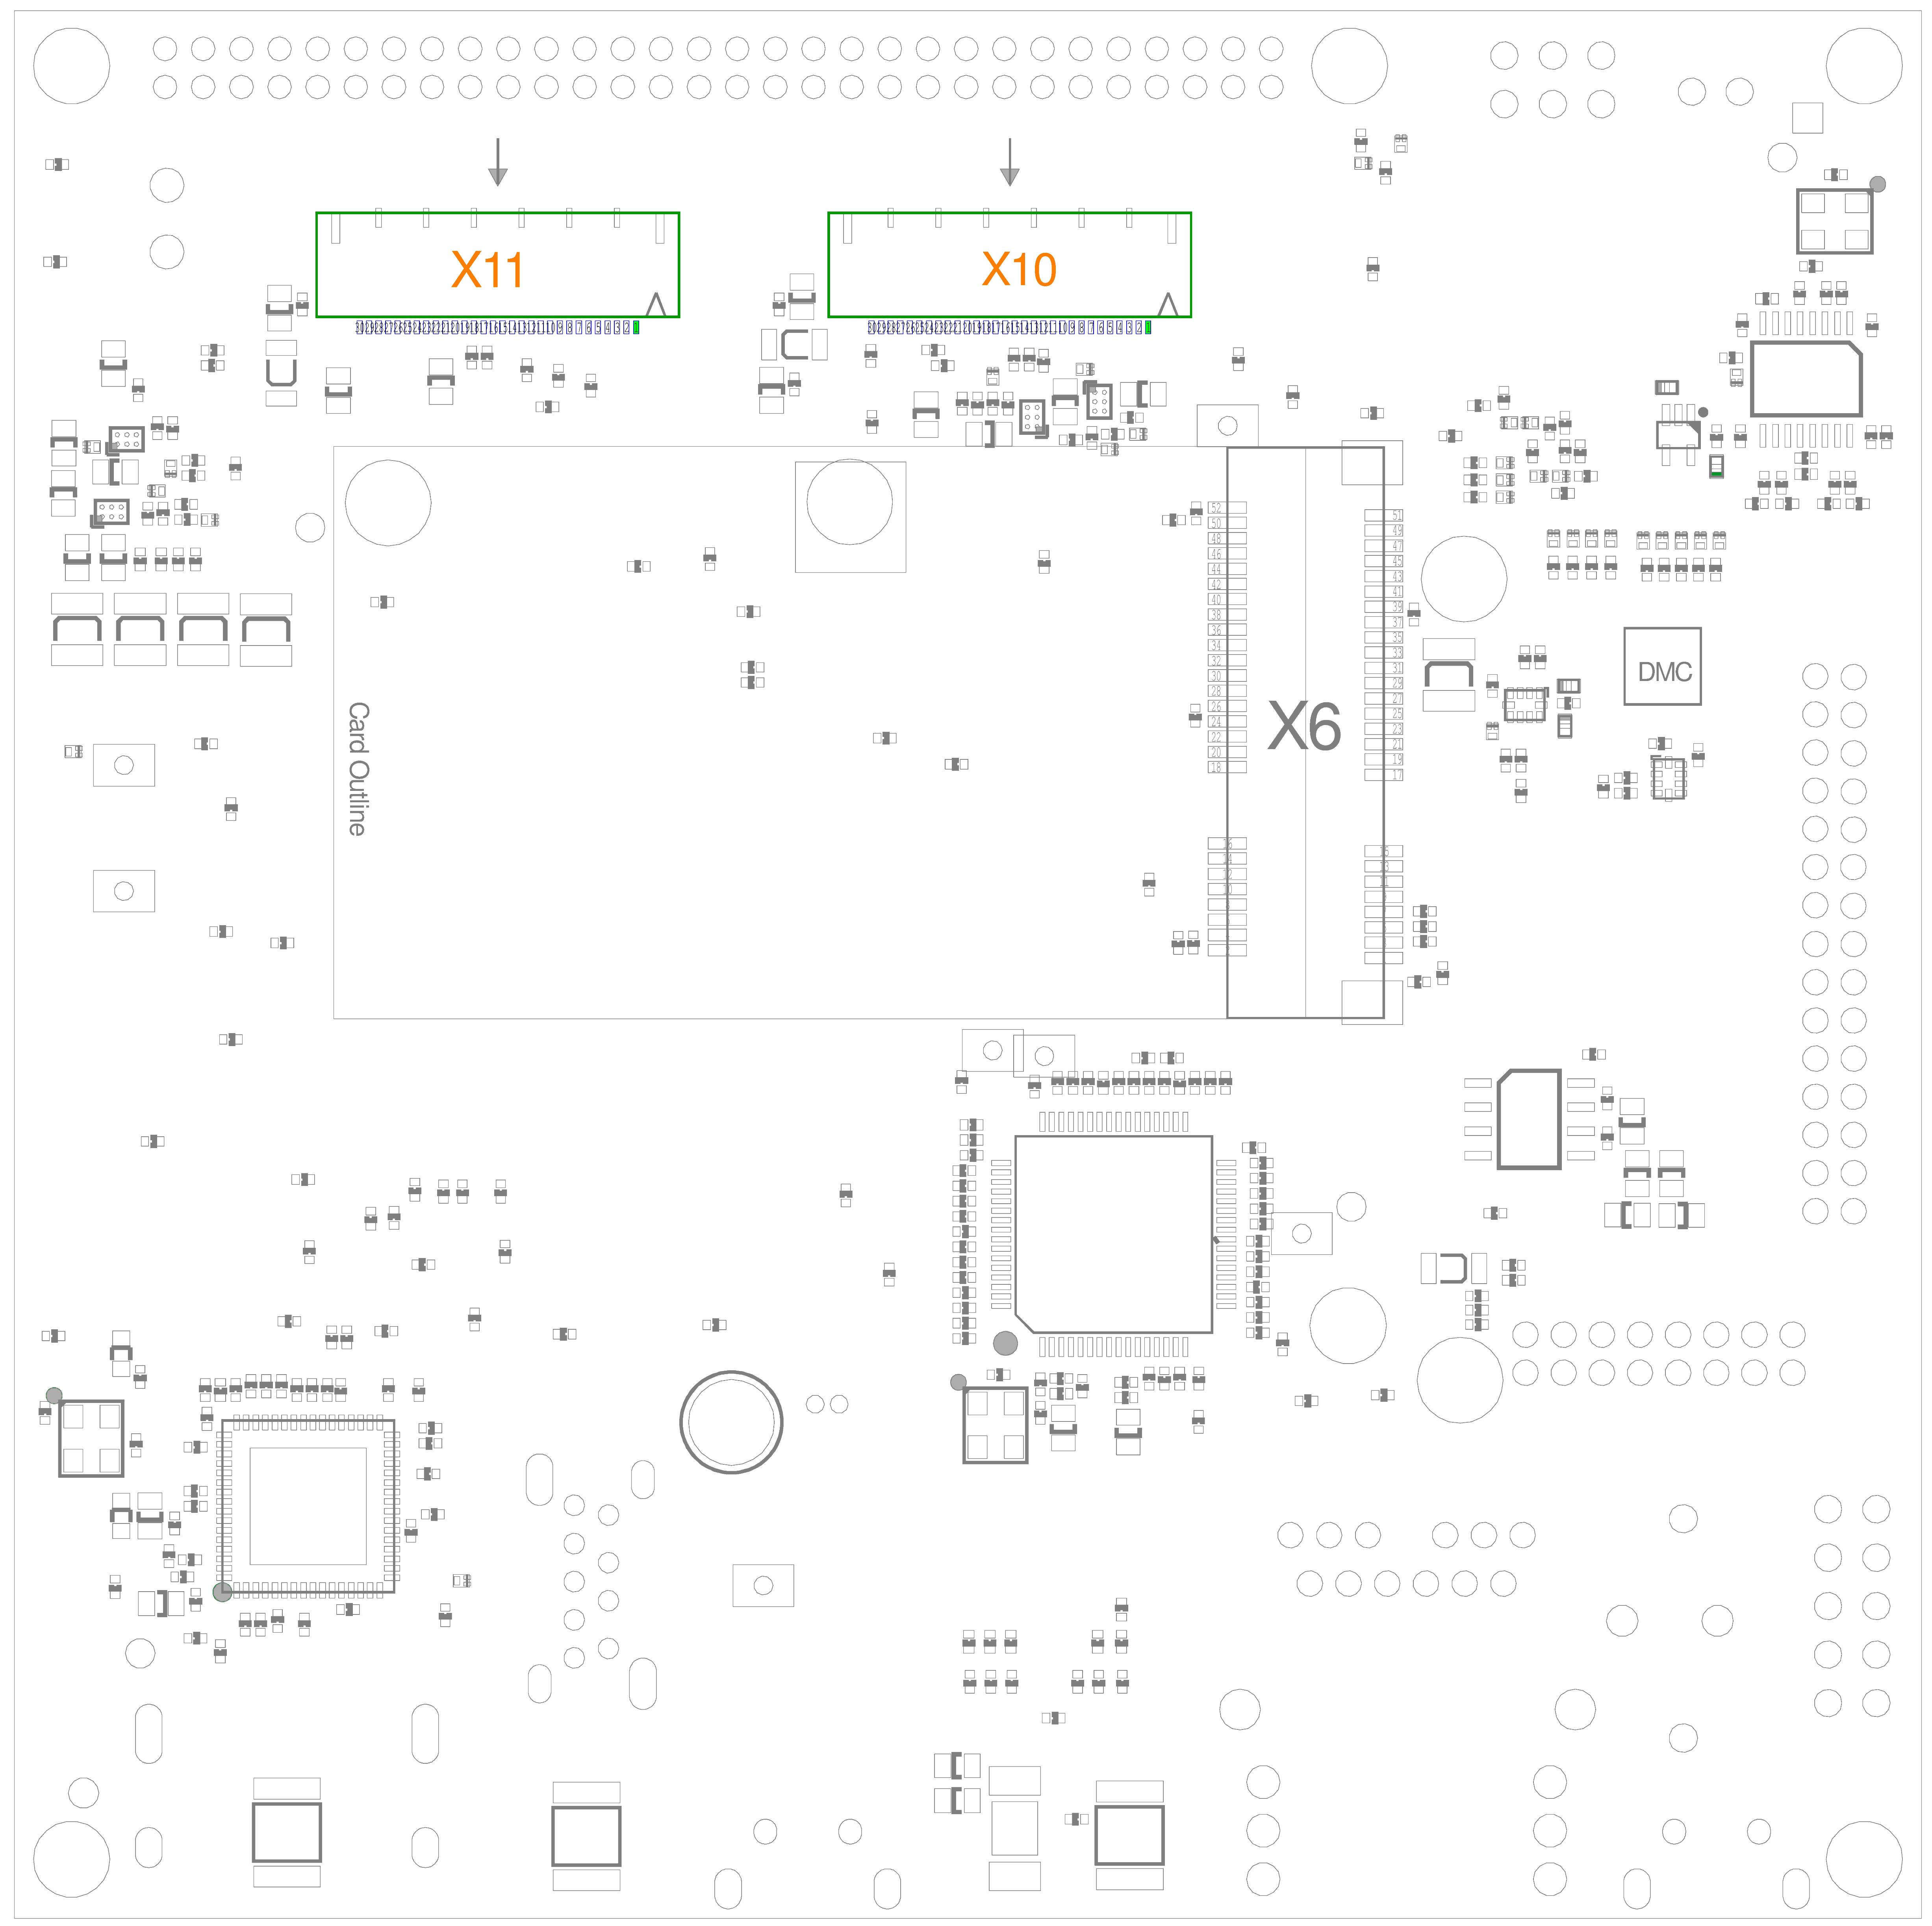 phyCAM-M MIPI CSI-2 Camera Interfaces (X10 and X11)